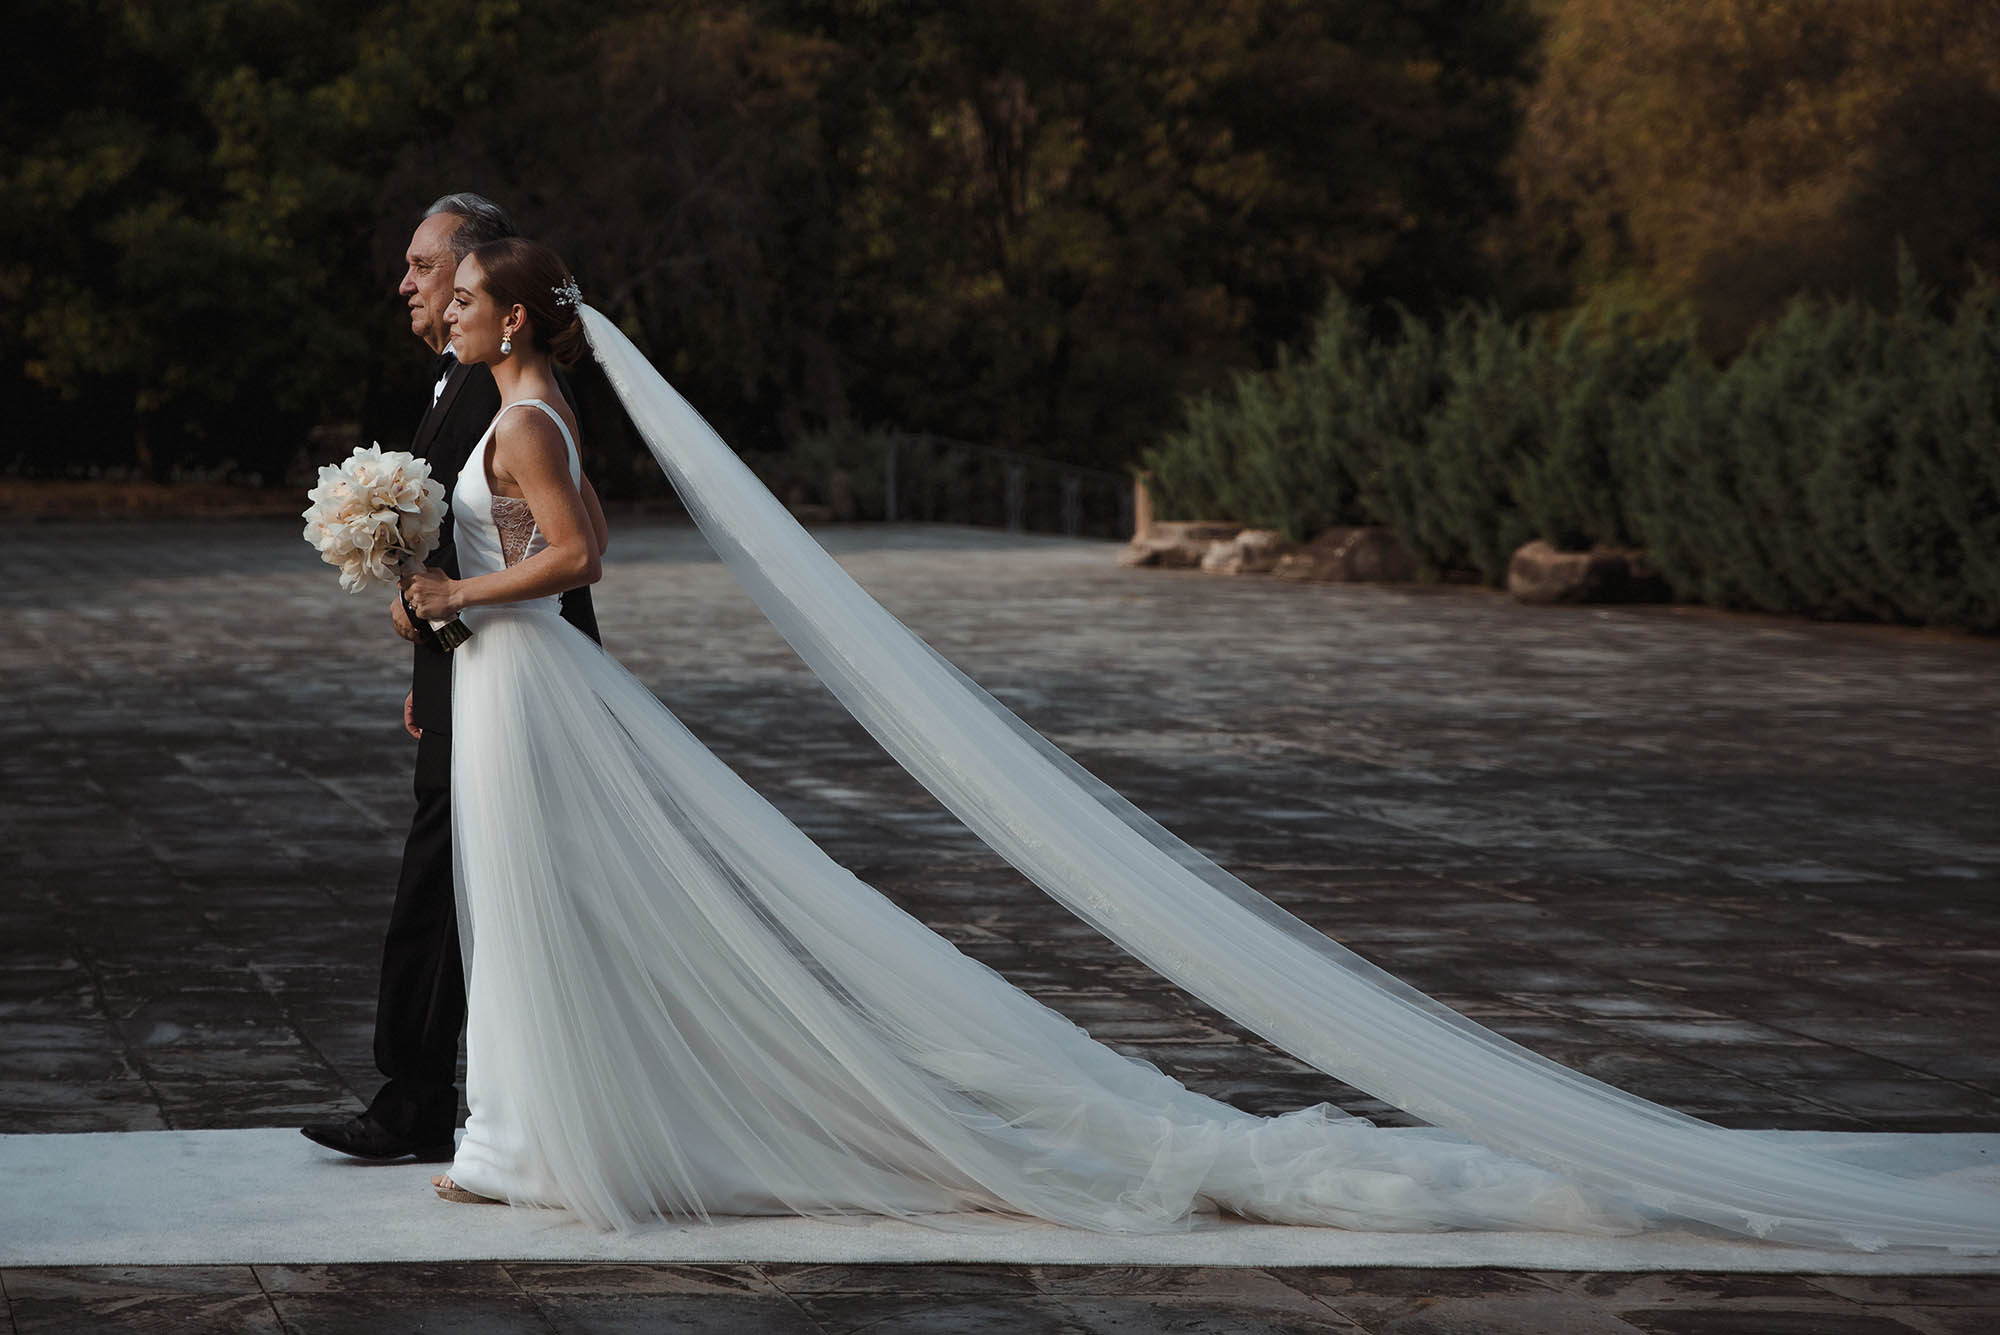 magali fotografo hacienda escoba guadalajara boda wedding 06.jpg